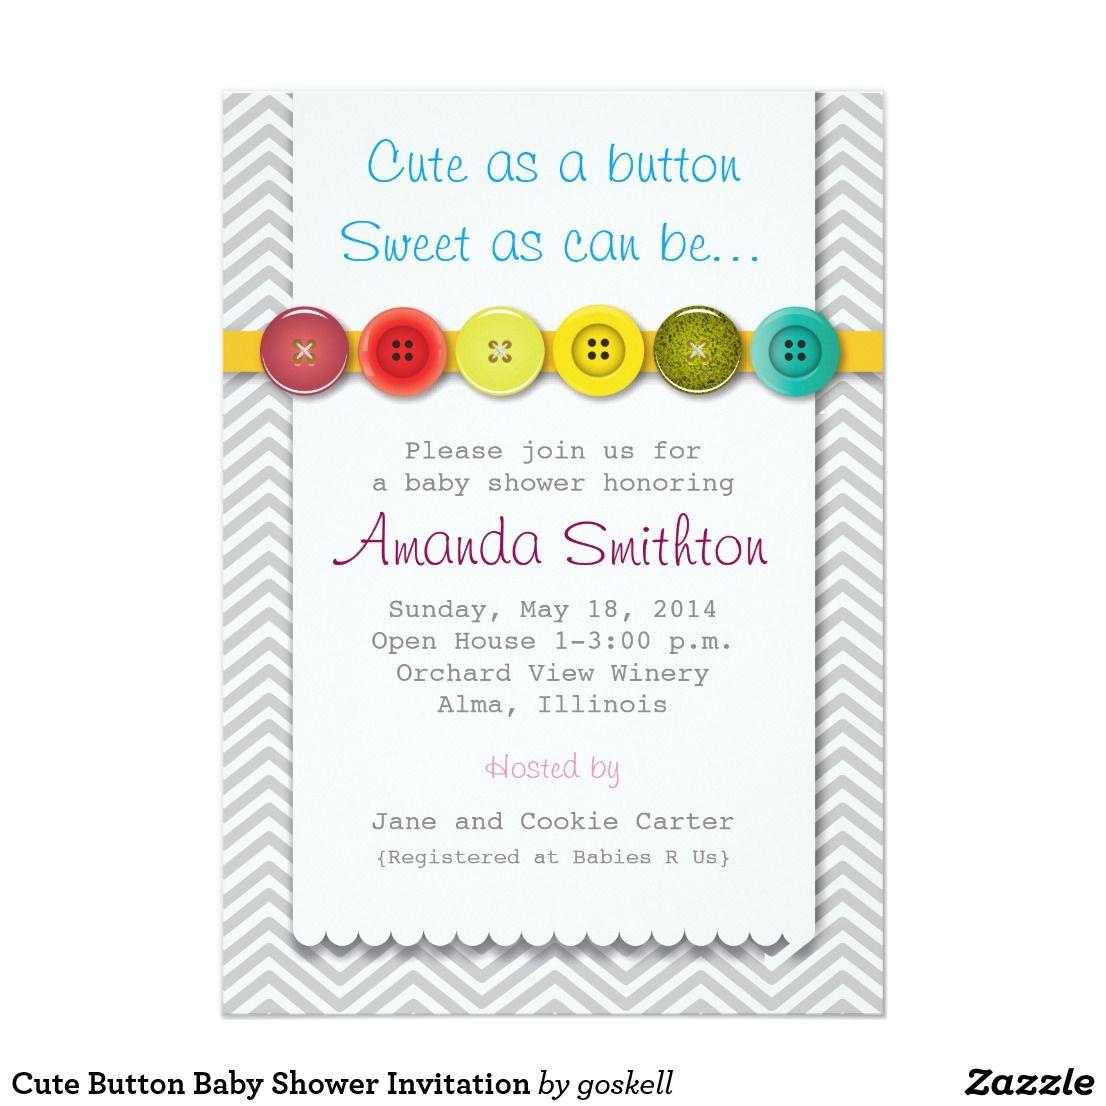 Cute Button Baby Shower Invitation | Shower invitations